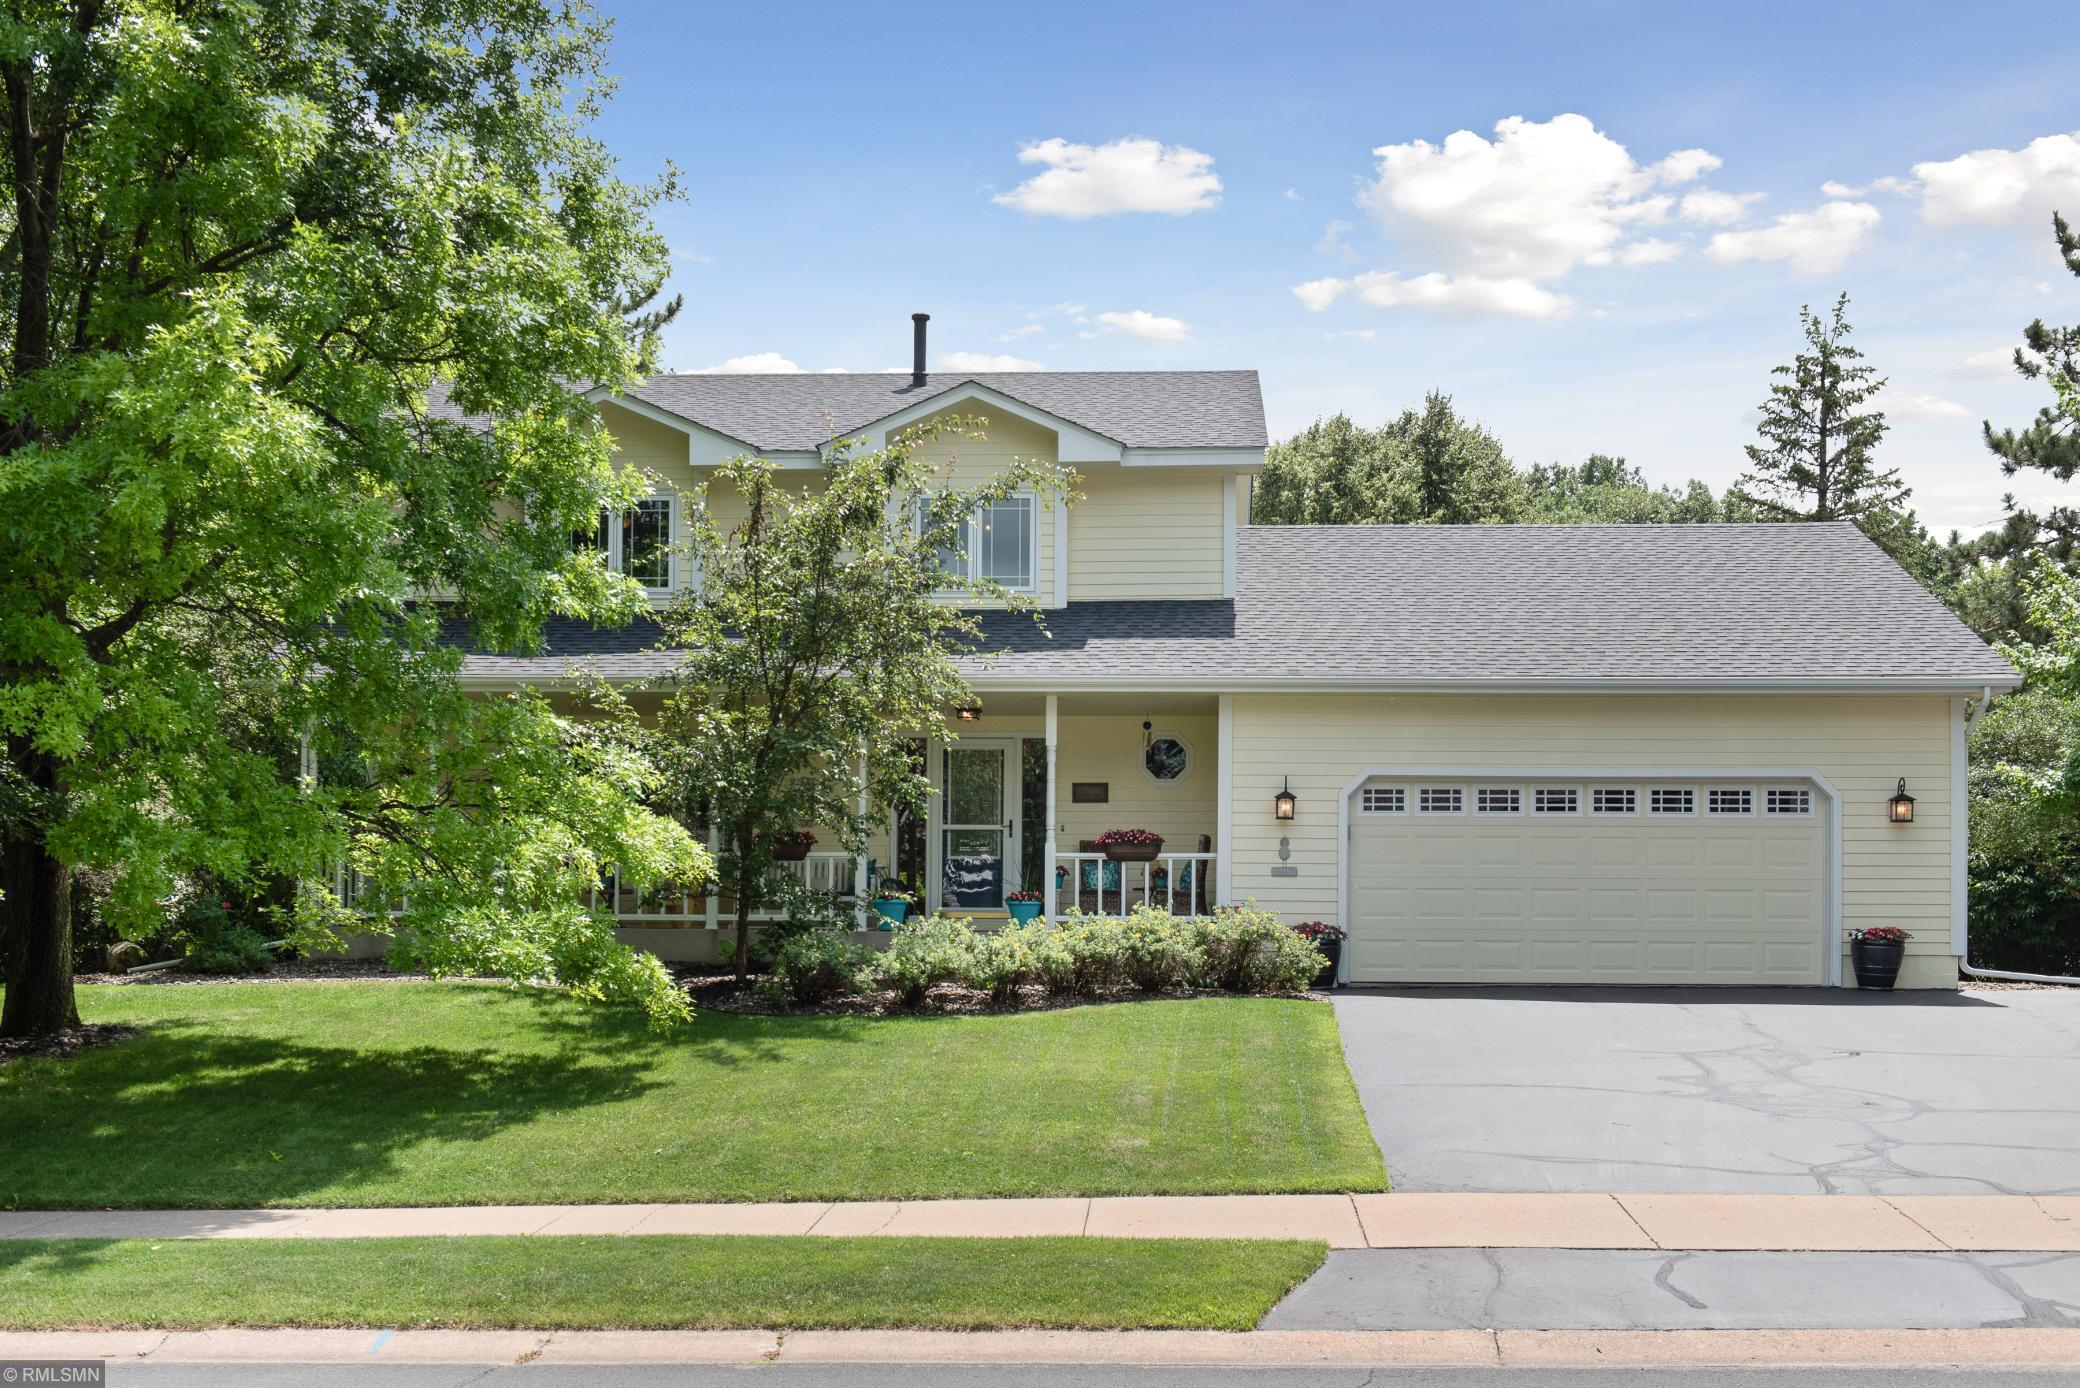 17403 Evener Way Property Photo - Eden Prairie, MN real estate listing